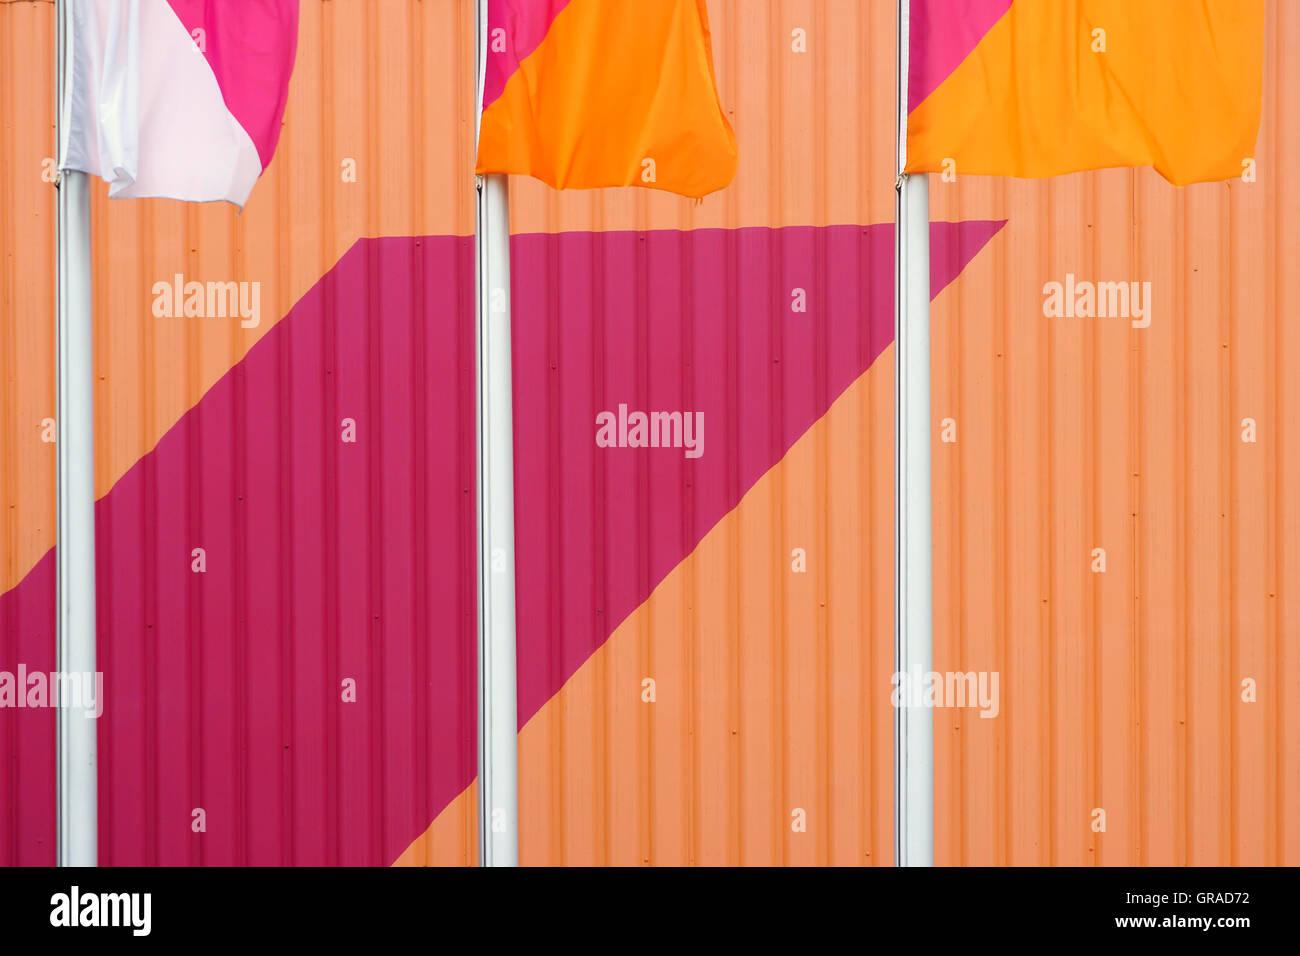 Waving Colors Stock Photo